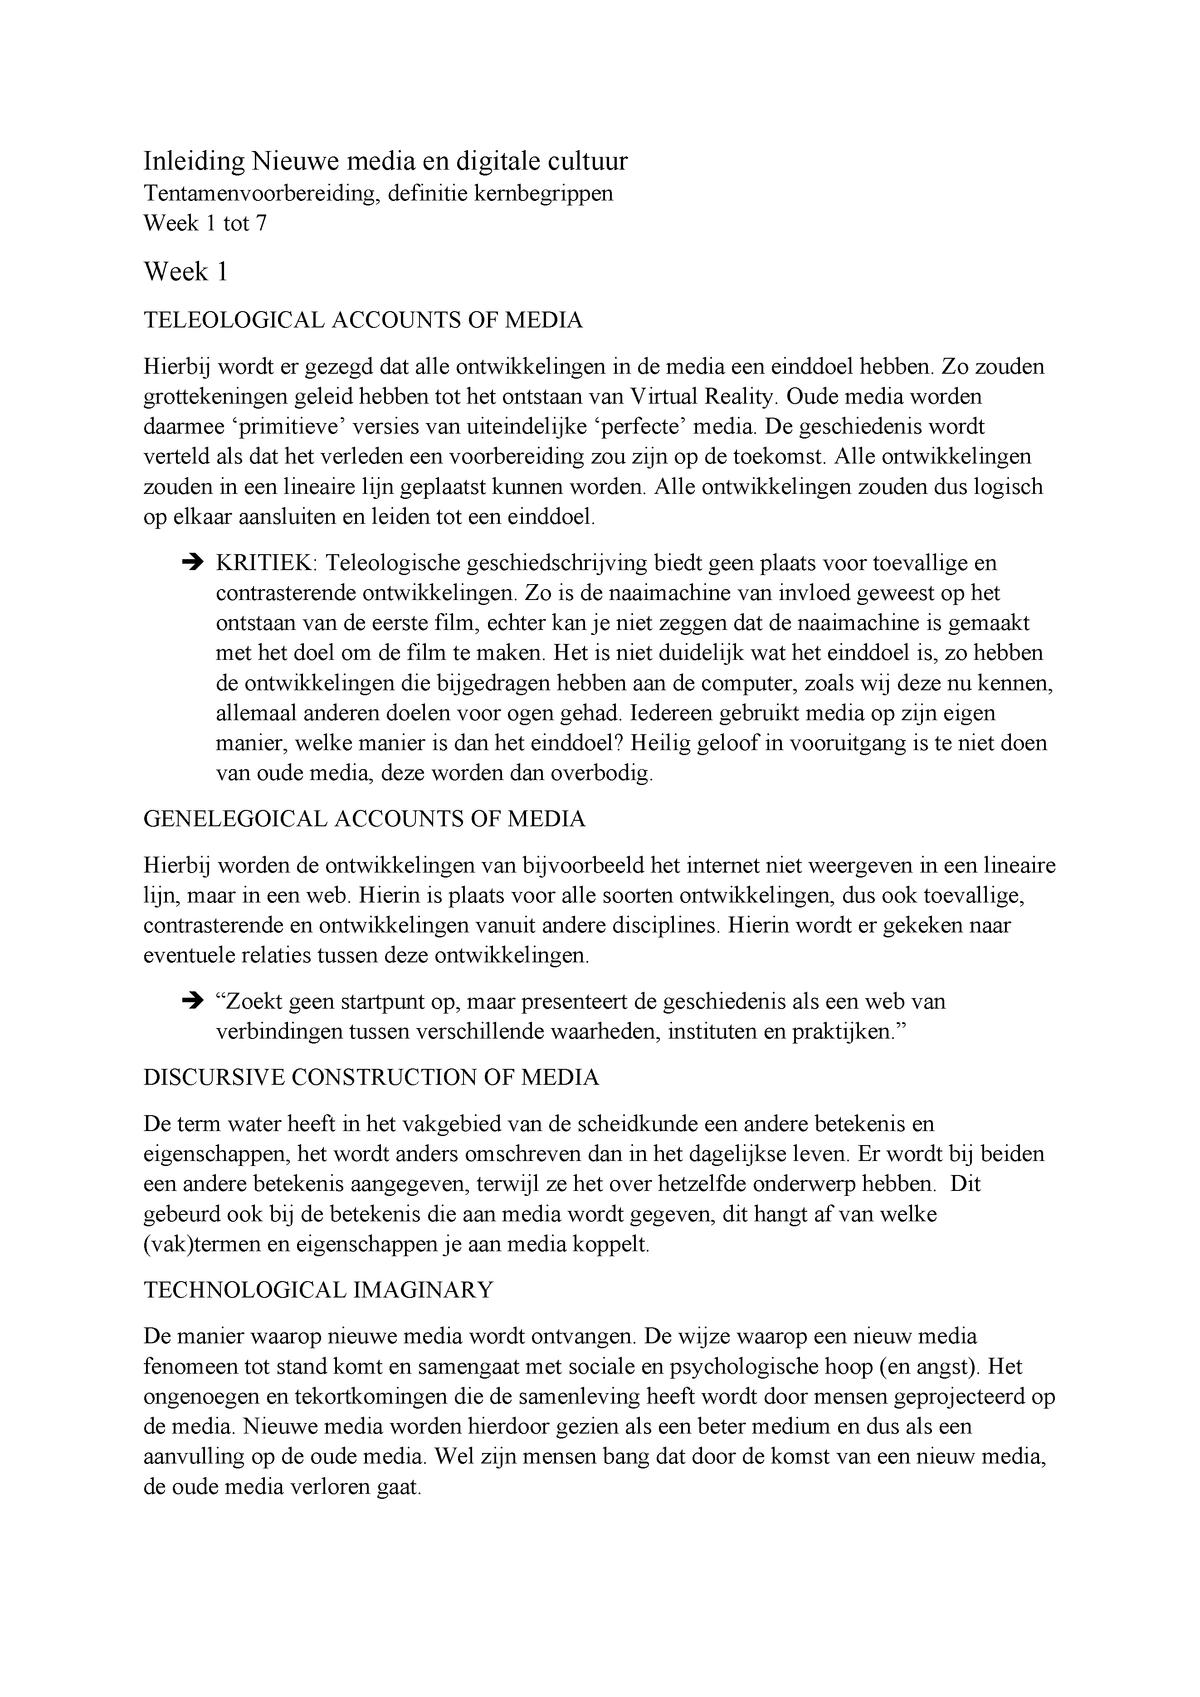 Definitie Kernbegrippen Week 1 Me2v15011 Studeersnel